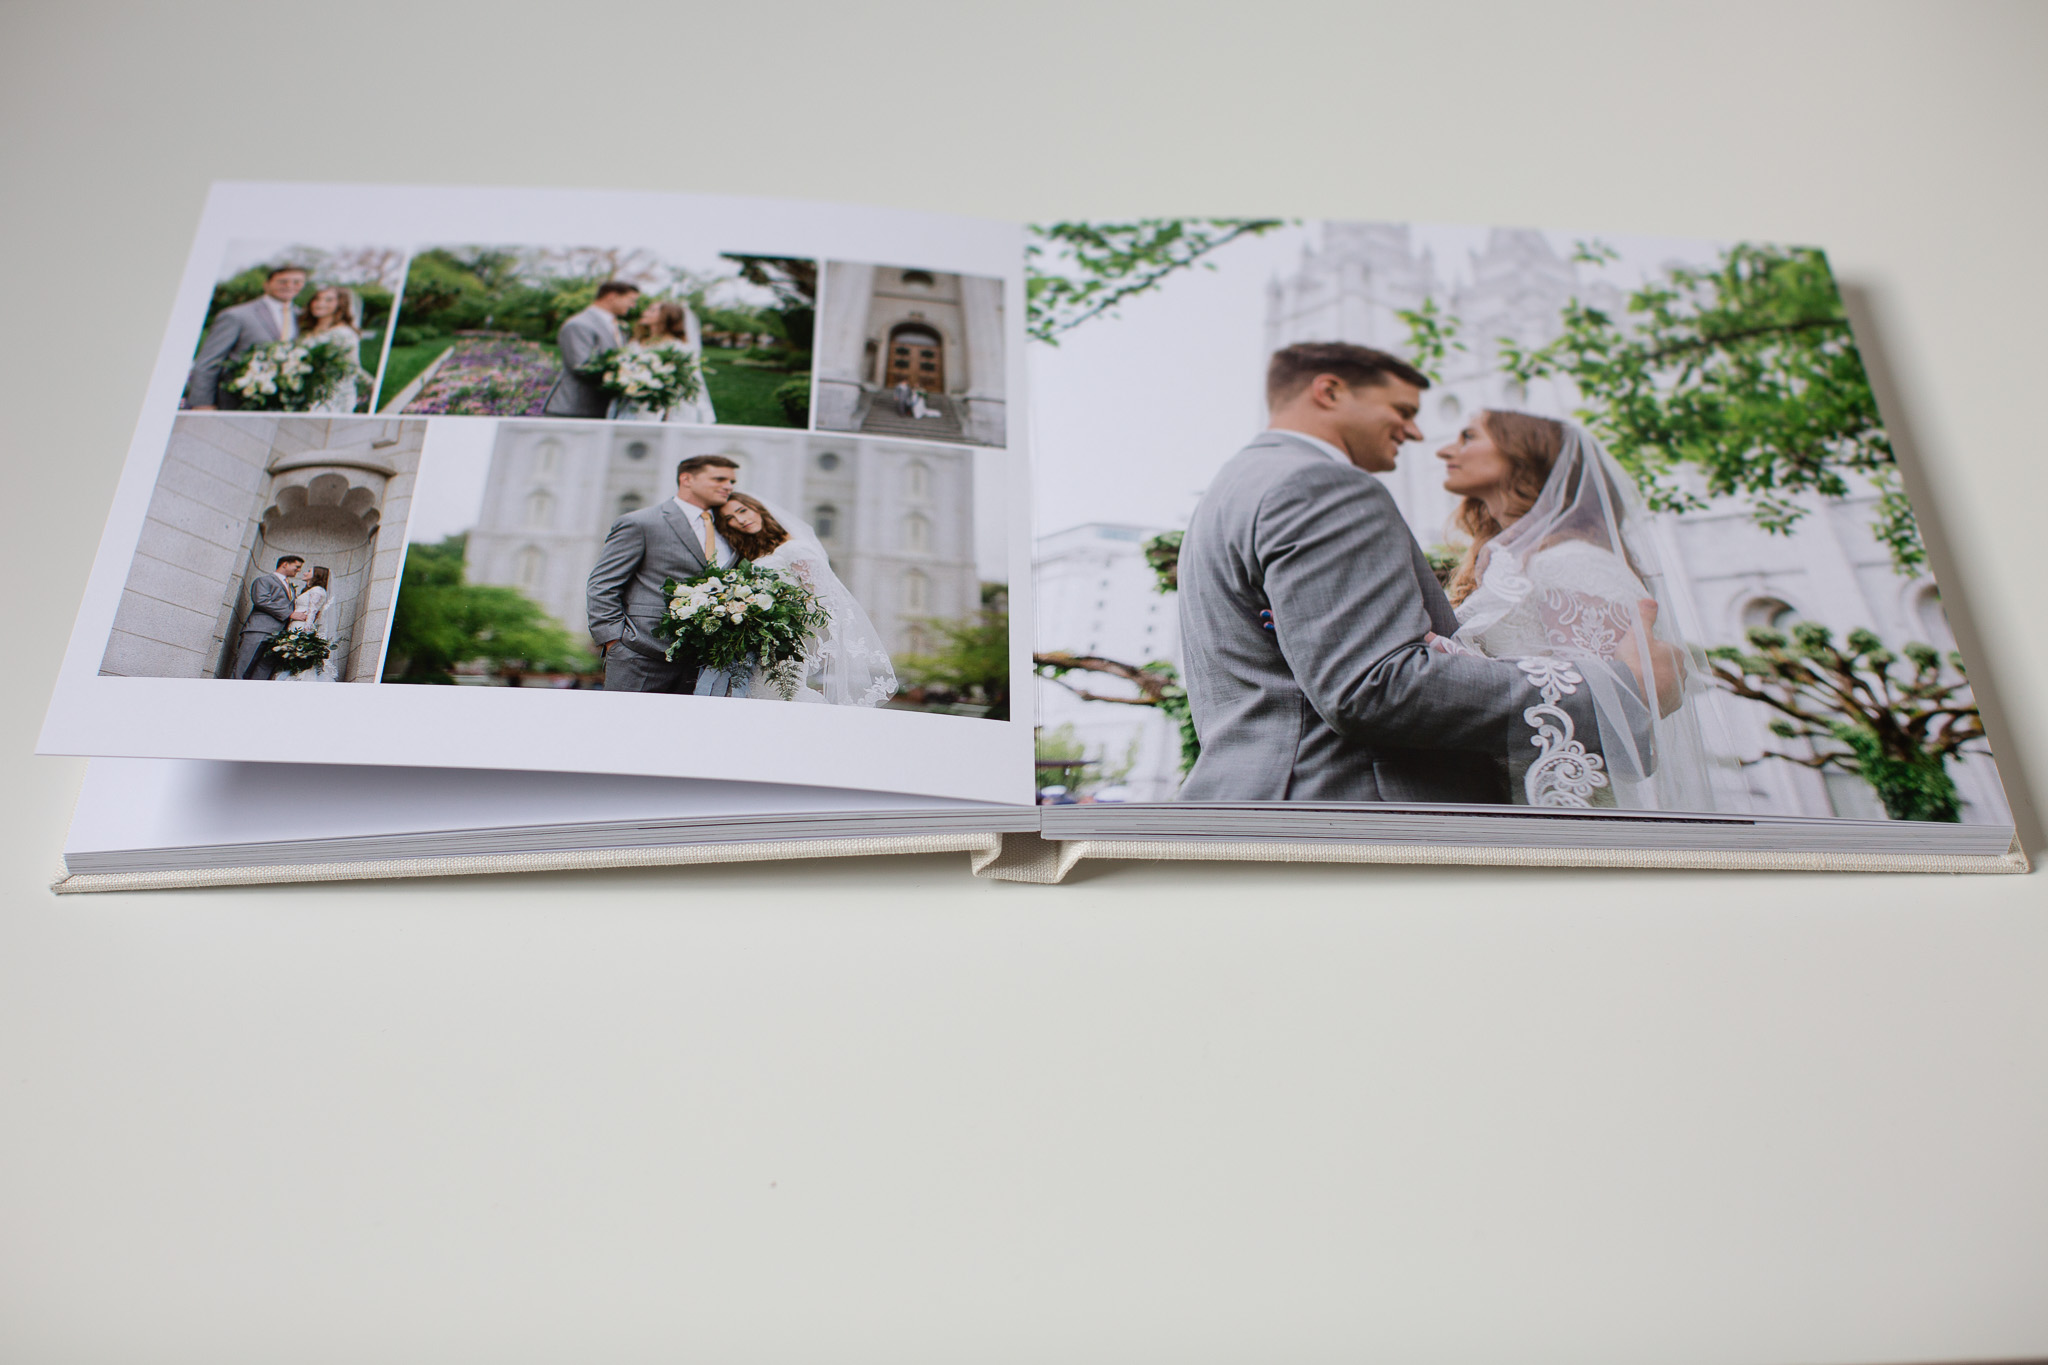 albumsbooks_JTP2019_005.jpg